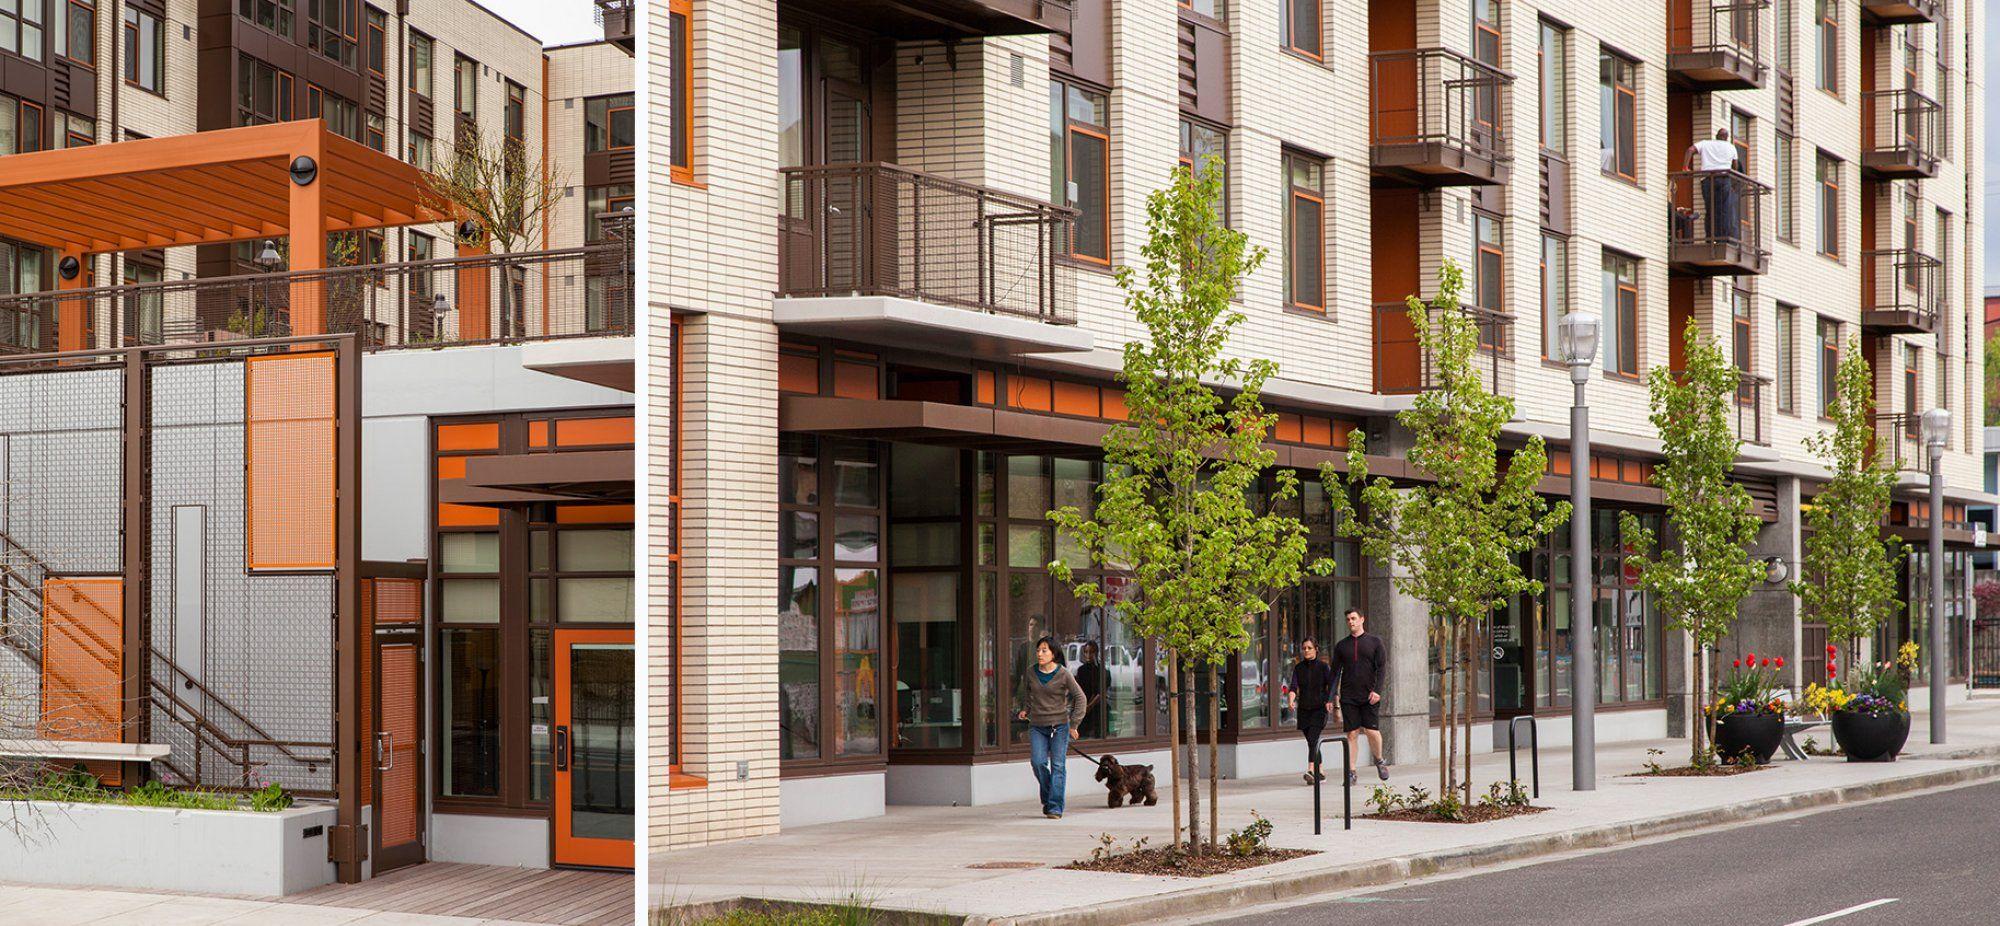 Gray S Landing Ankrom Moisan Architects Inc Architecture Mix Use Building Multifamily Housing